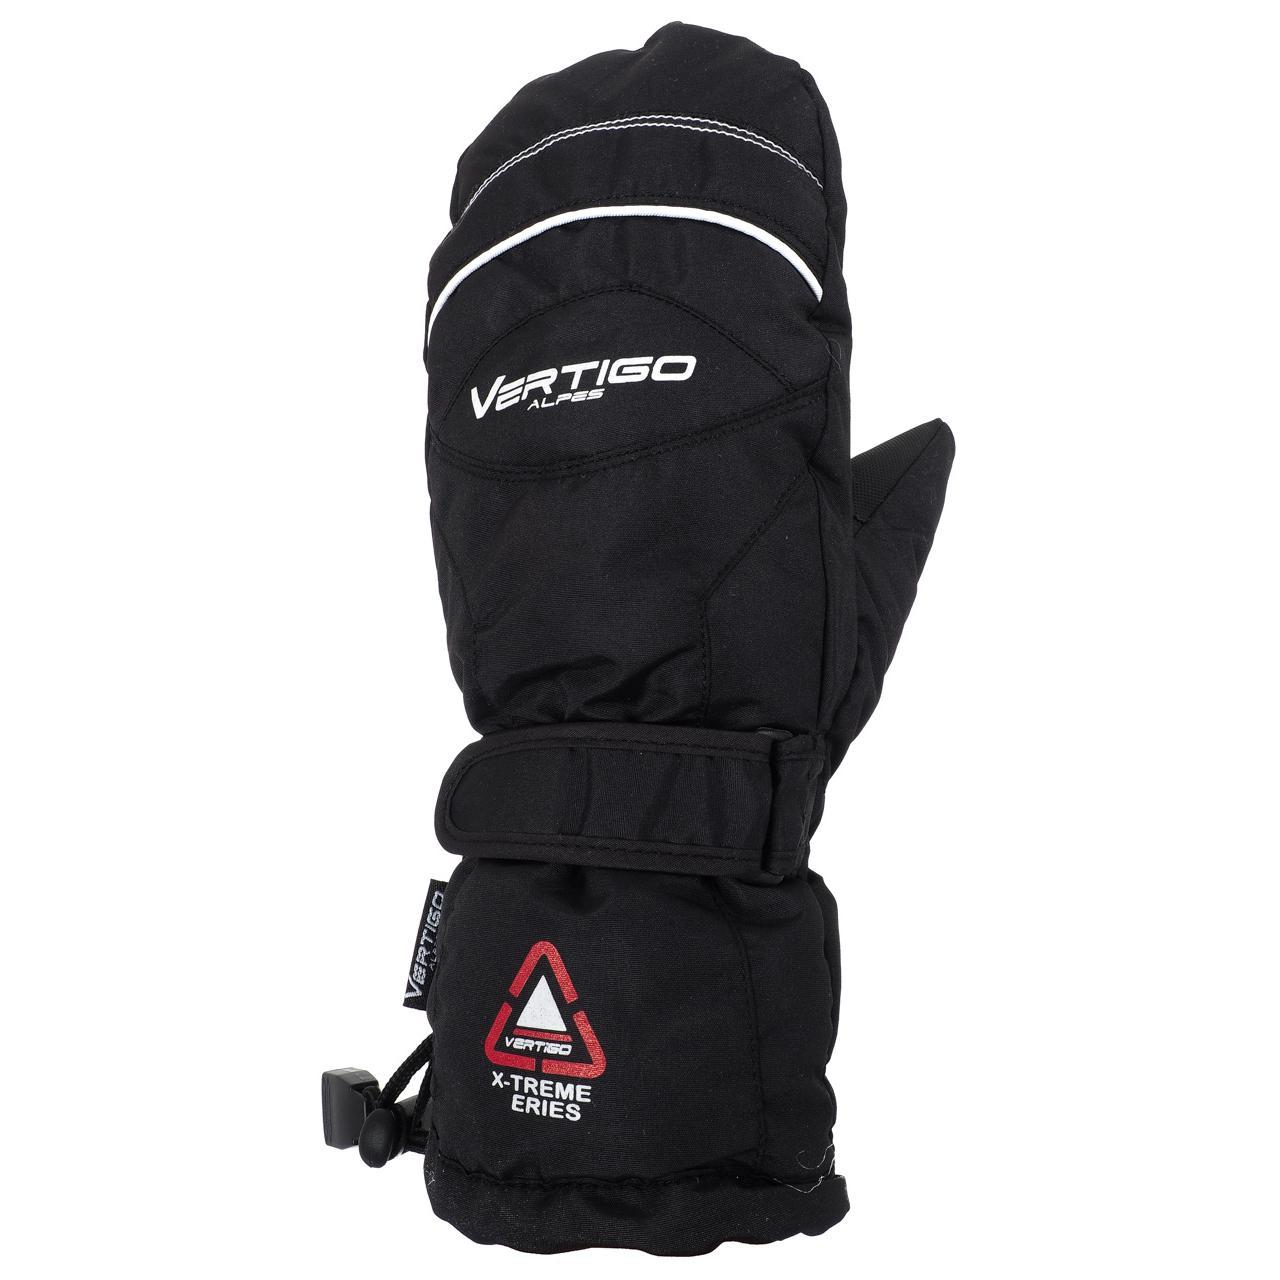 Mittens-Alpes-Vertigo-Xeo-Black-Mitts-Black-26005-New